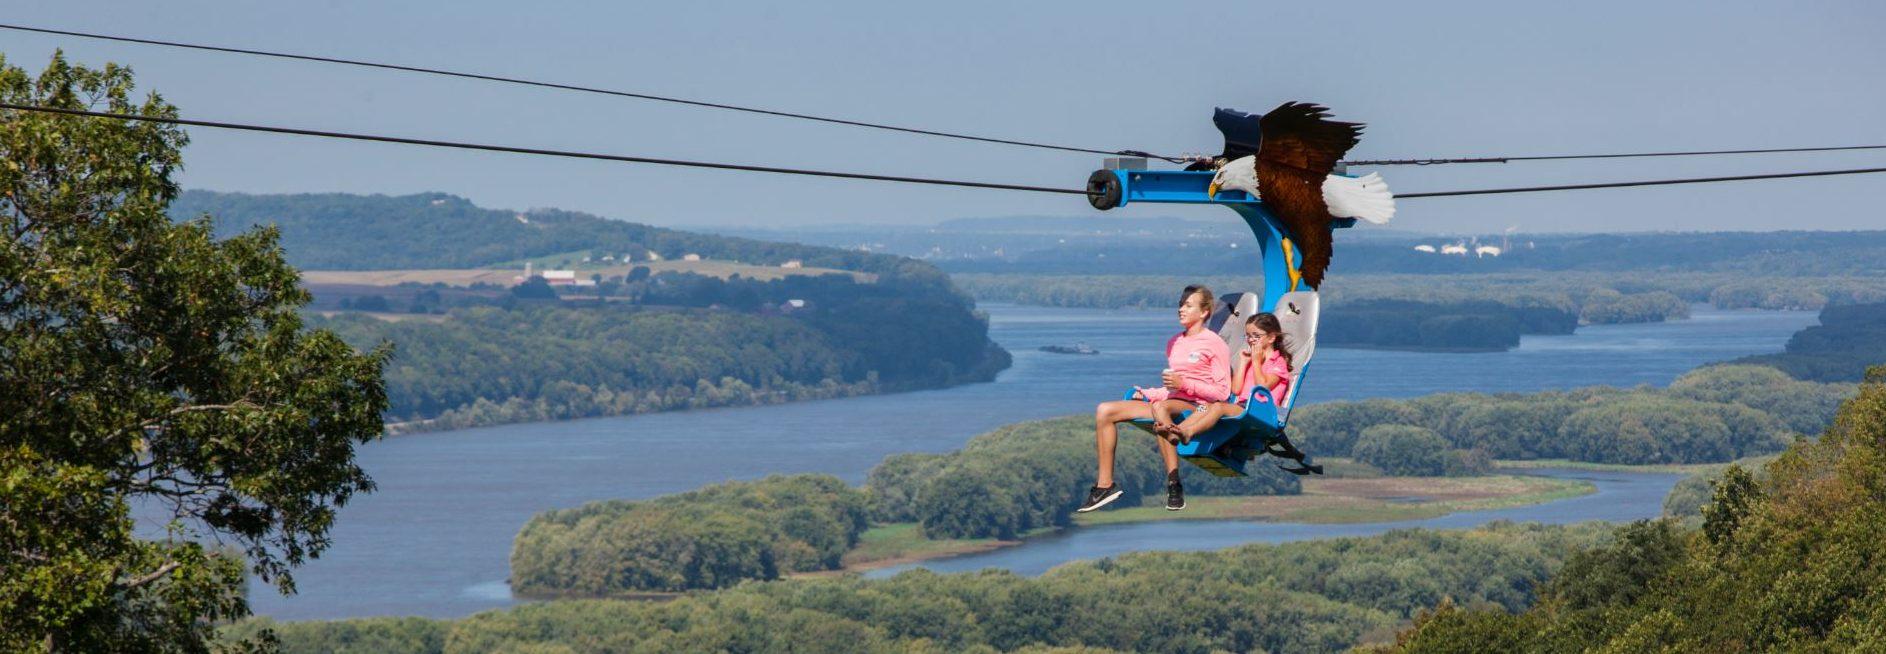 soaring eagle zipline | chestnut mountain resort